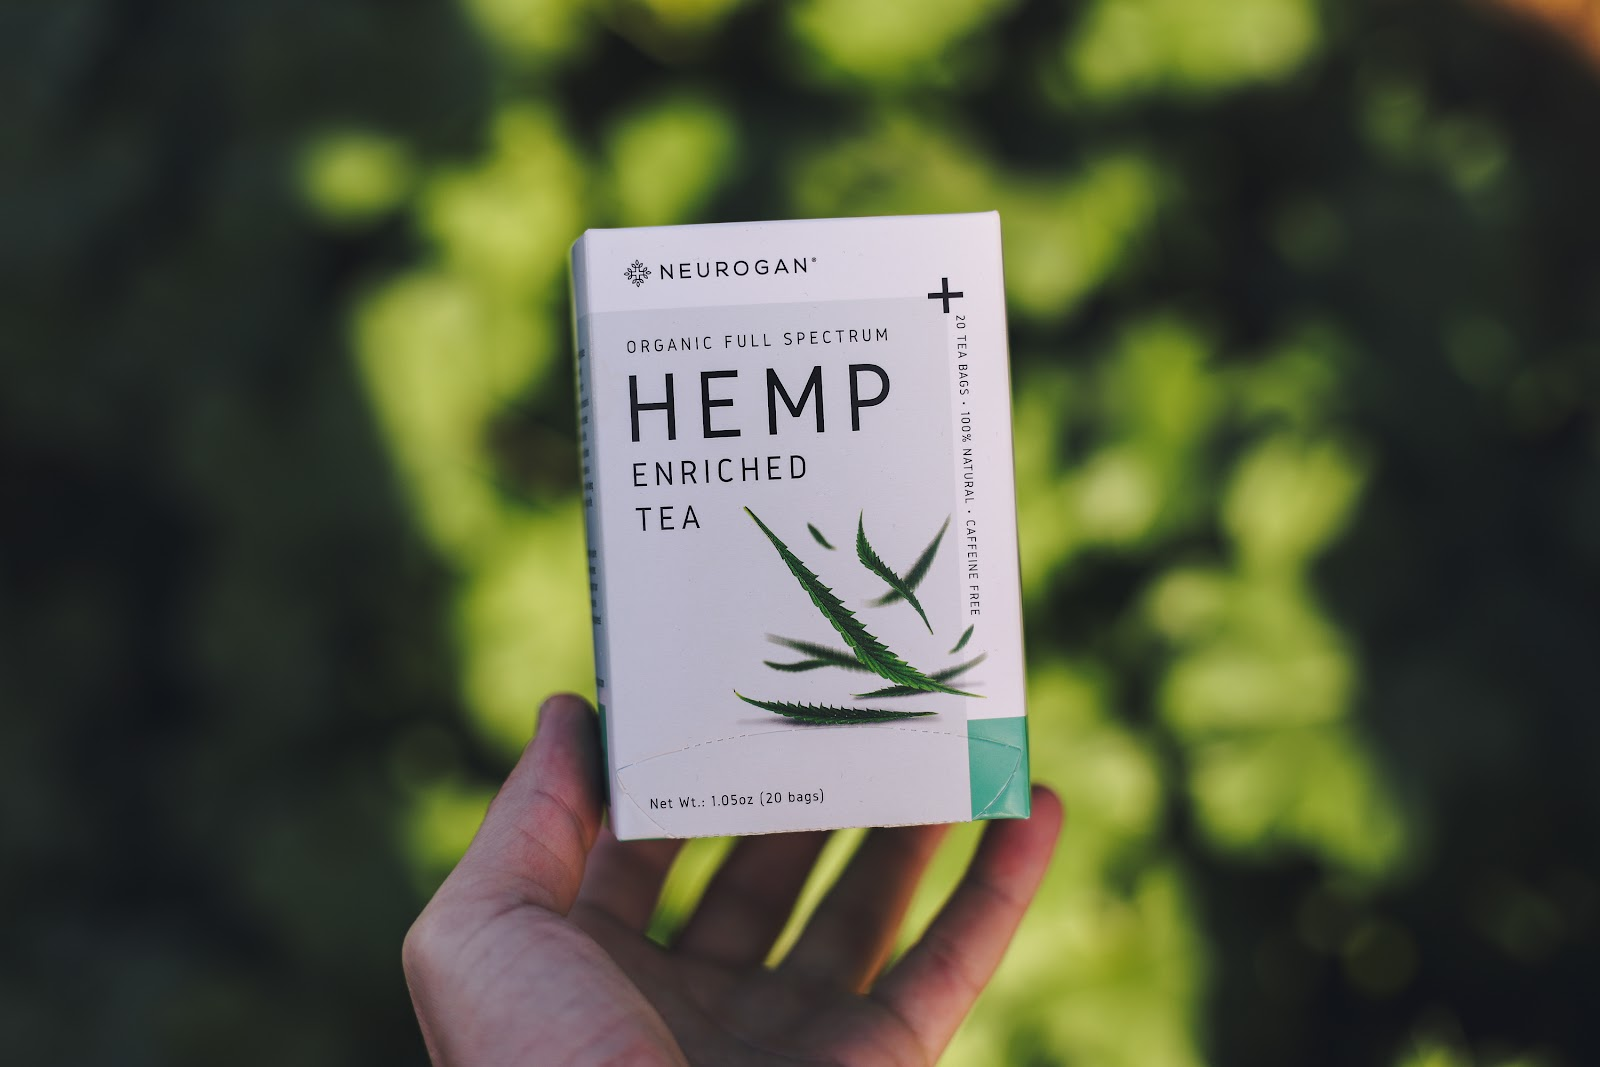 neurogan hemp enriched tea